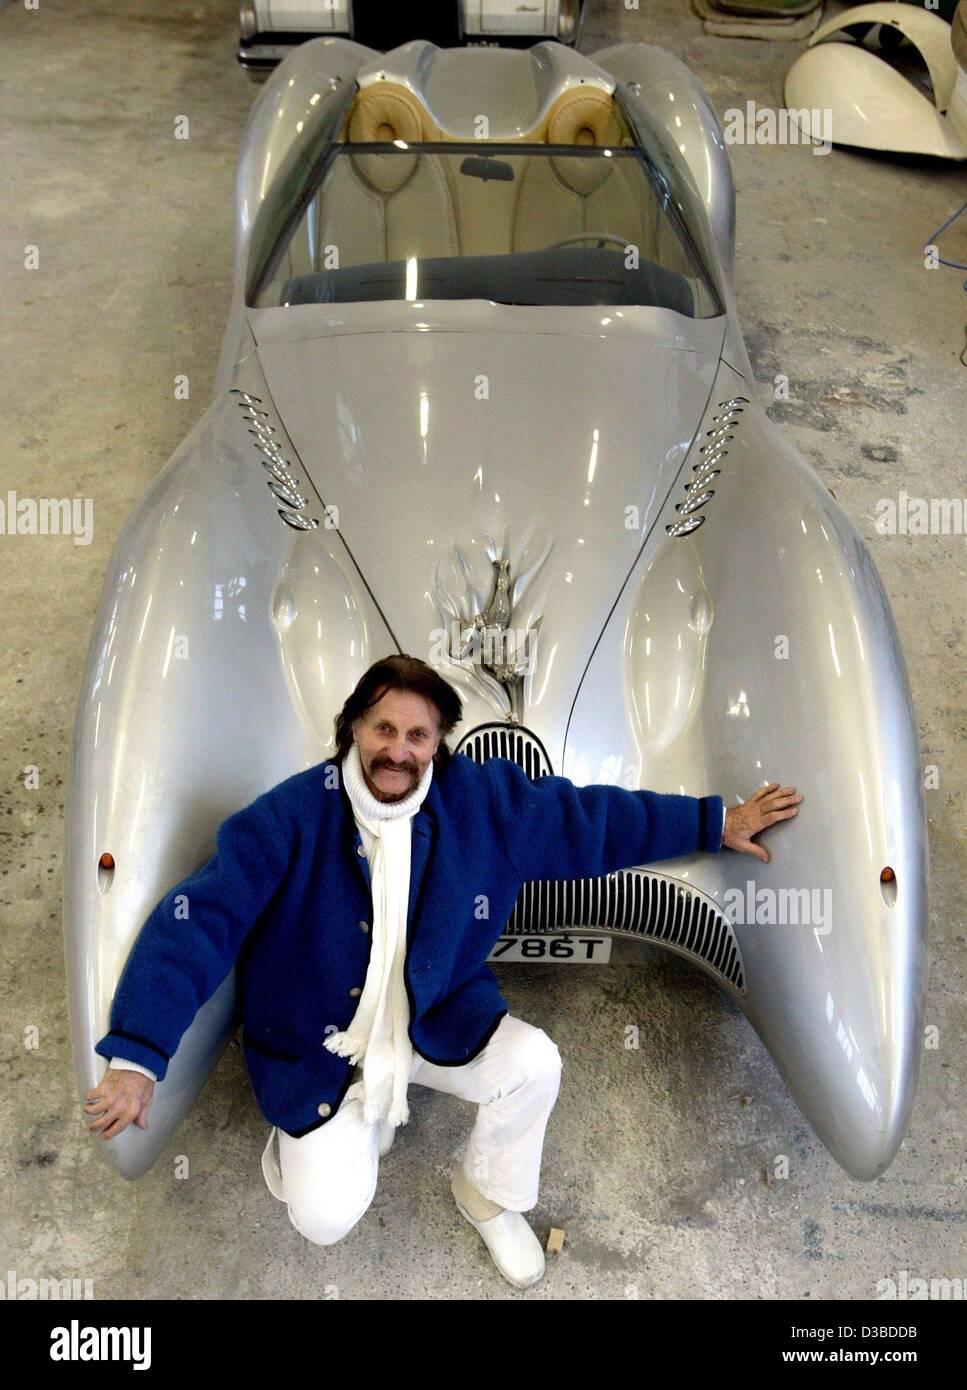 (Dpa) - Diseñador Industrial Luigi Colani es orgullosamente posando con un Horch Colani C1 coche (500 hp, V8) Imagen De Stock